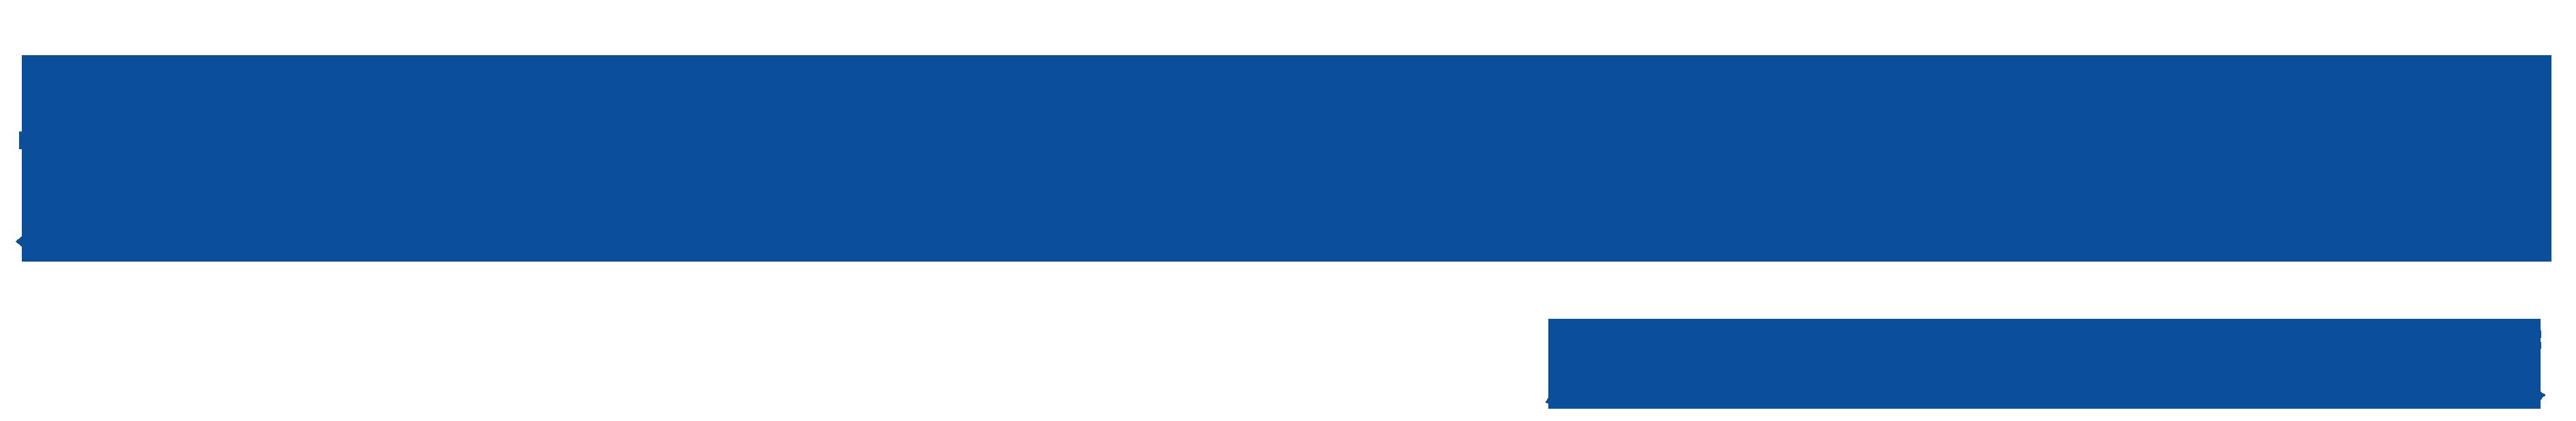 AG彩票站App下载新能源有限公司